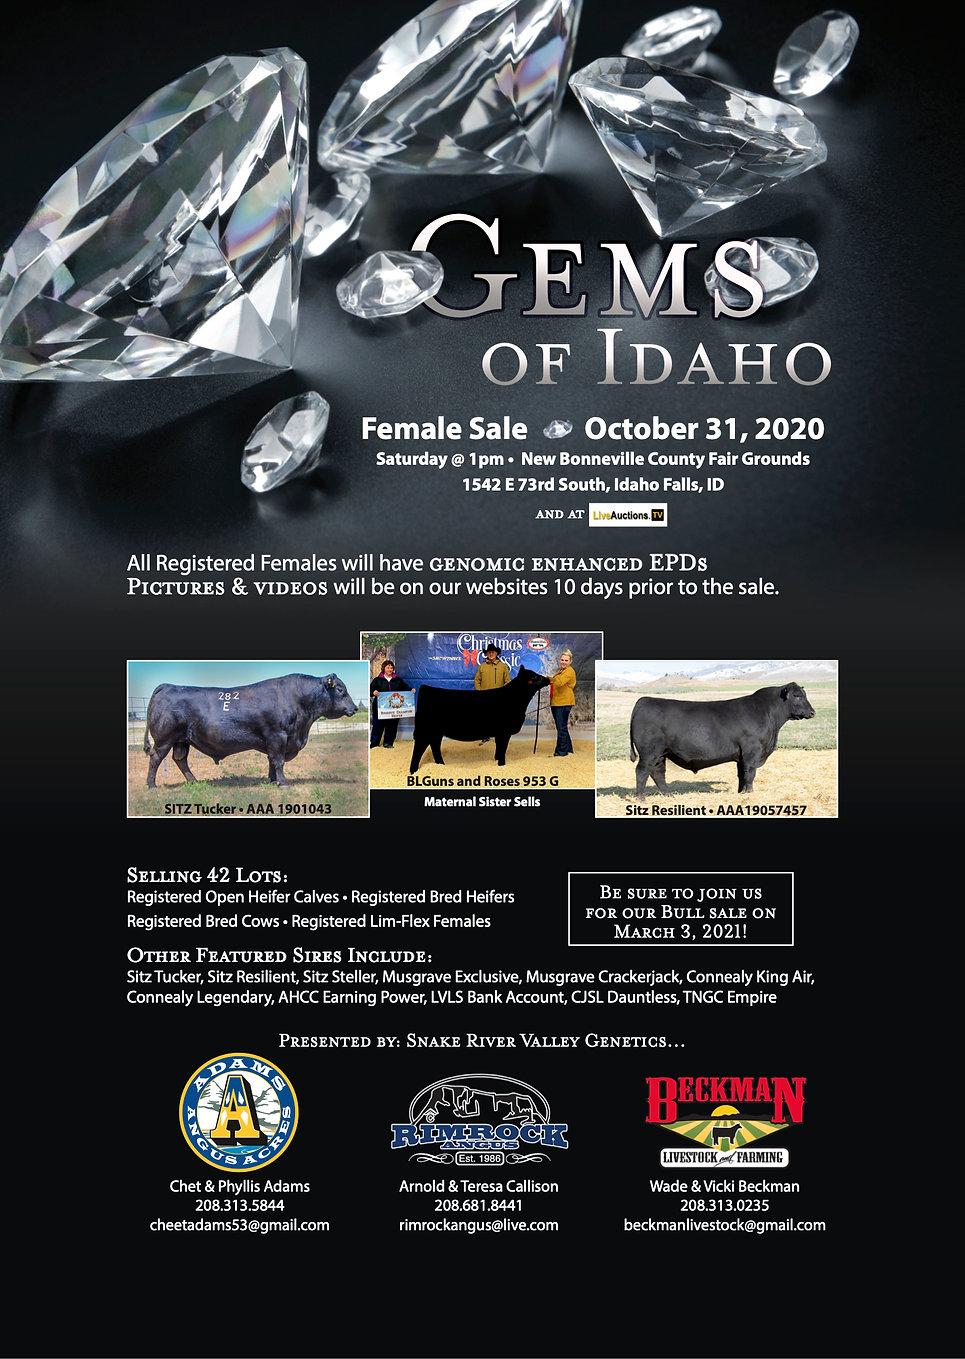 Gems of Idaho.jpg